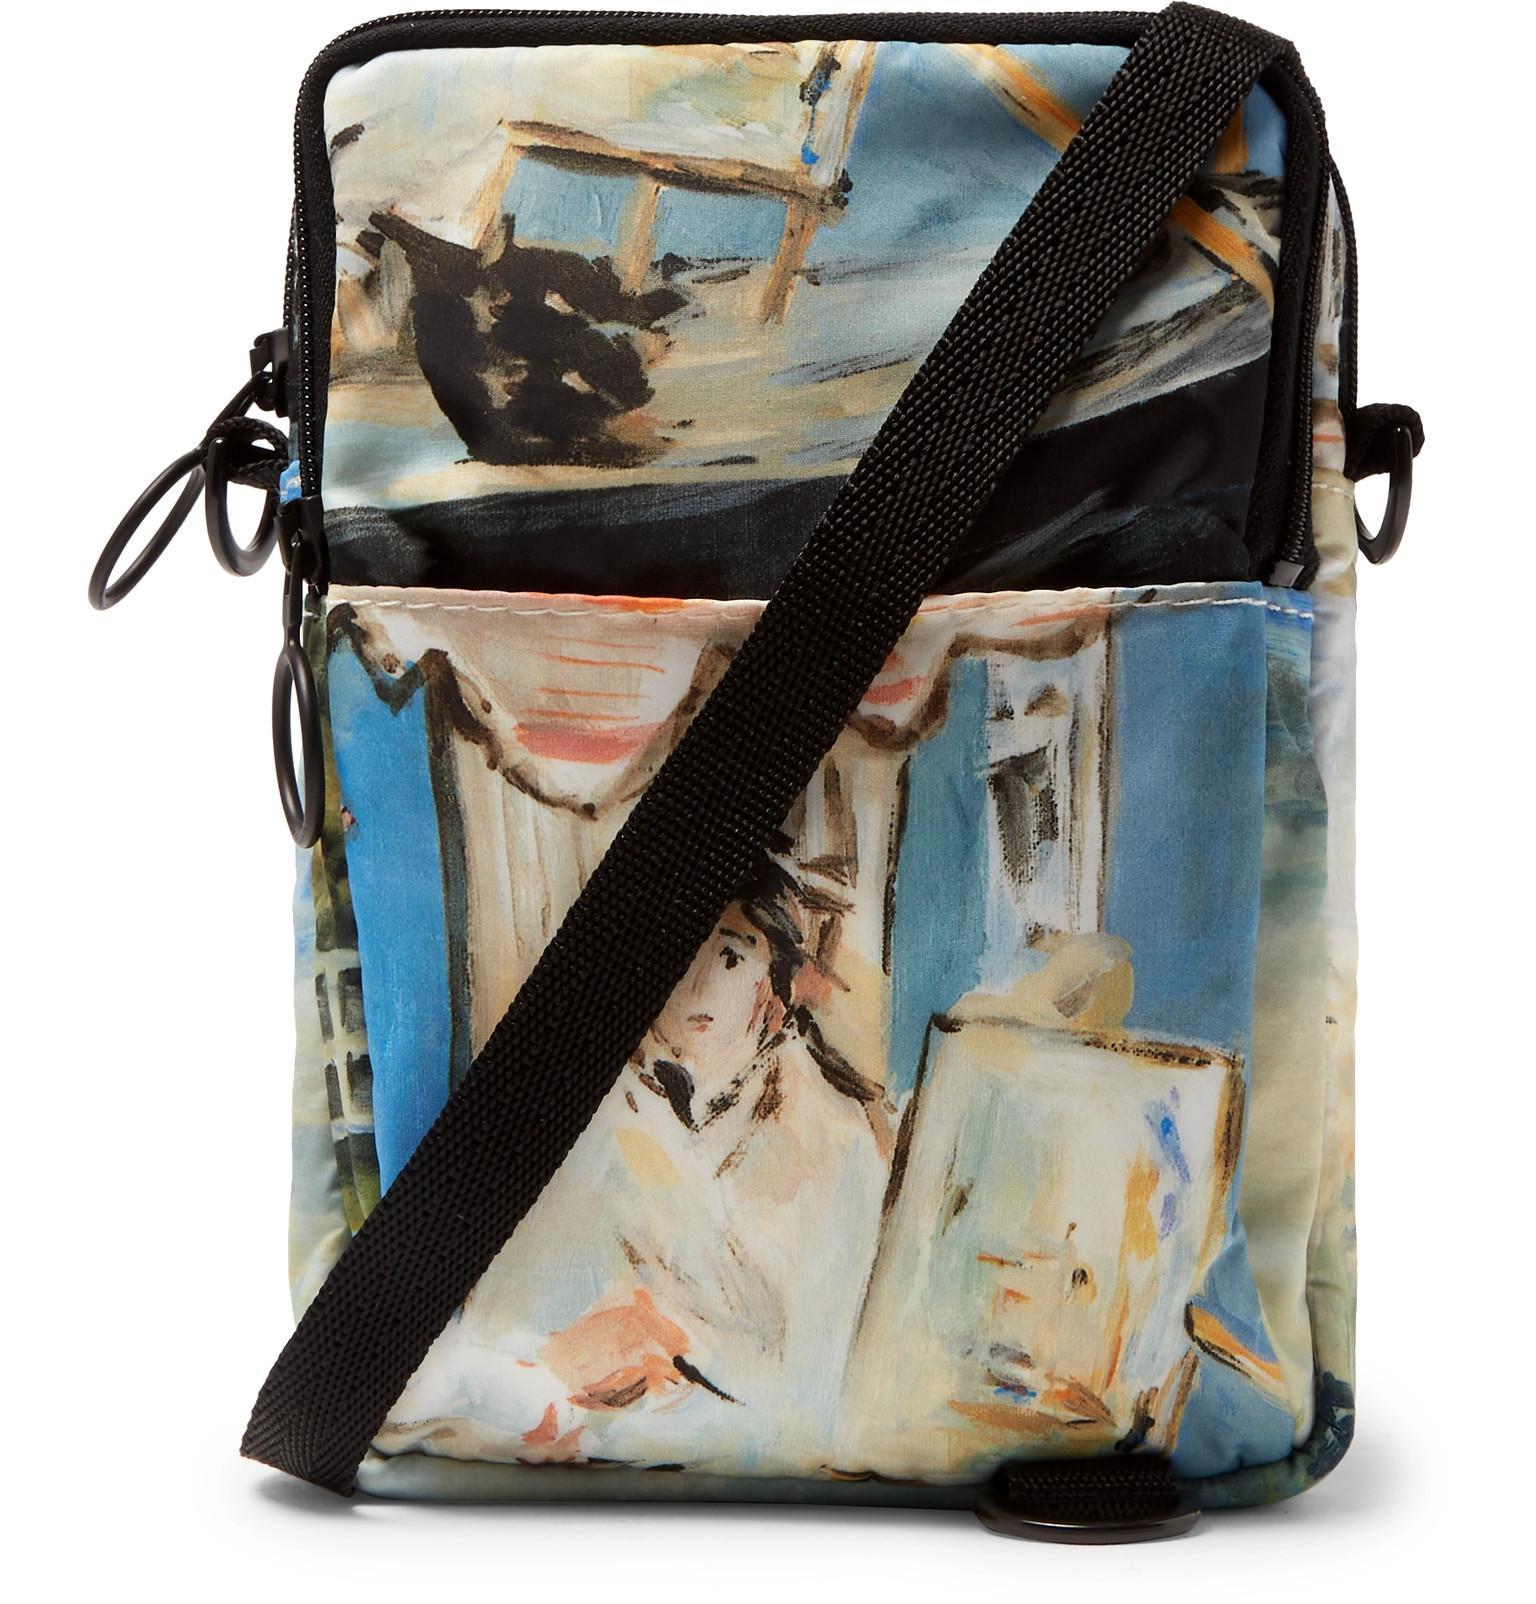 bab7c50a427 Off-White c o Virgil Abloh Printed Shell Messenger Bag in Blue for ...